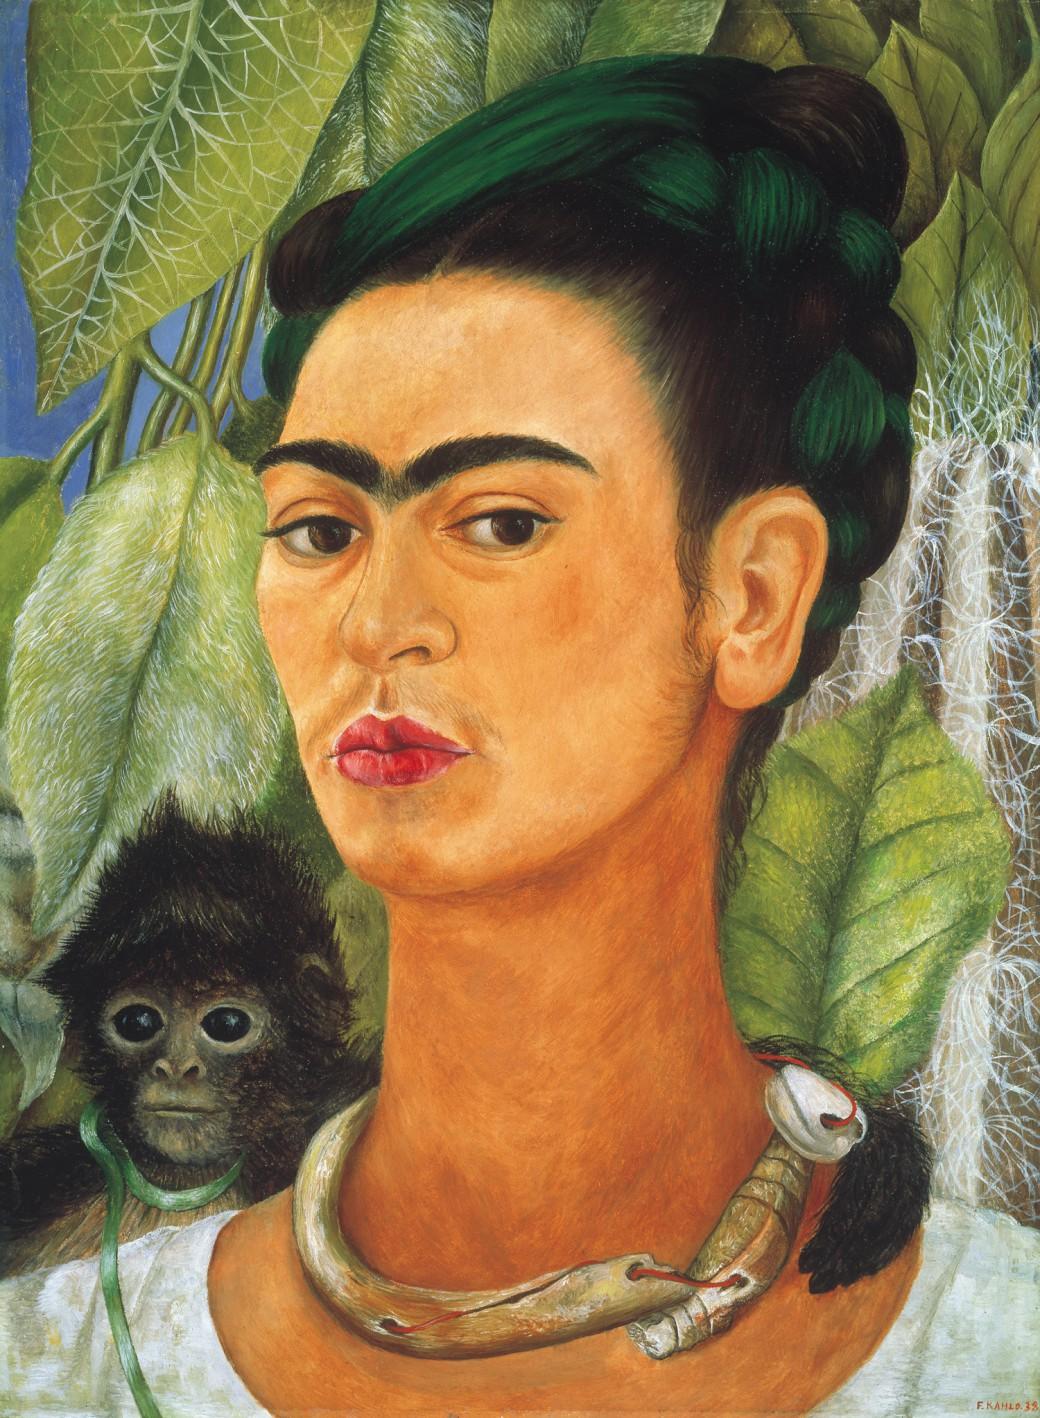 Finestre su Arte, Cinema e Musica: Animali nell'arte - Frida Kahlo